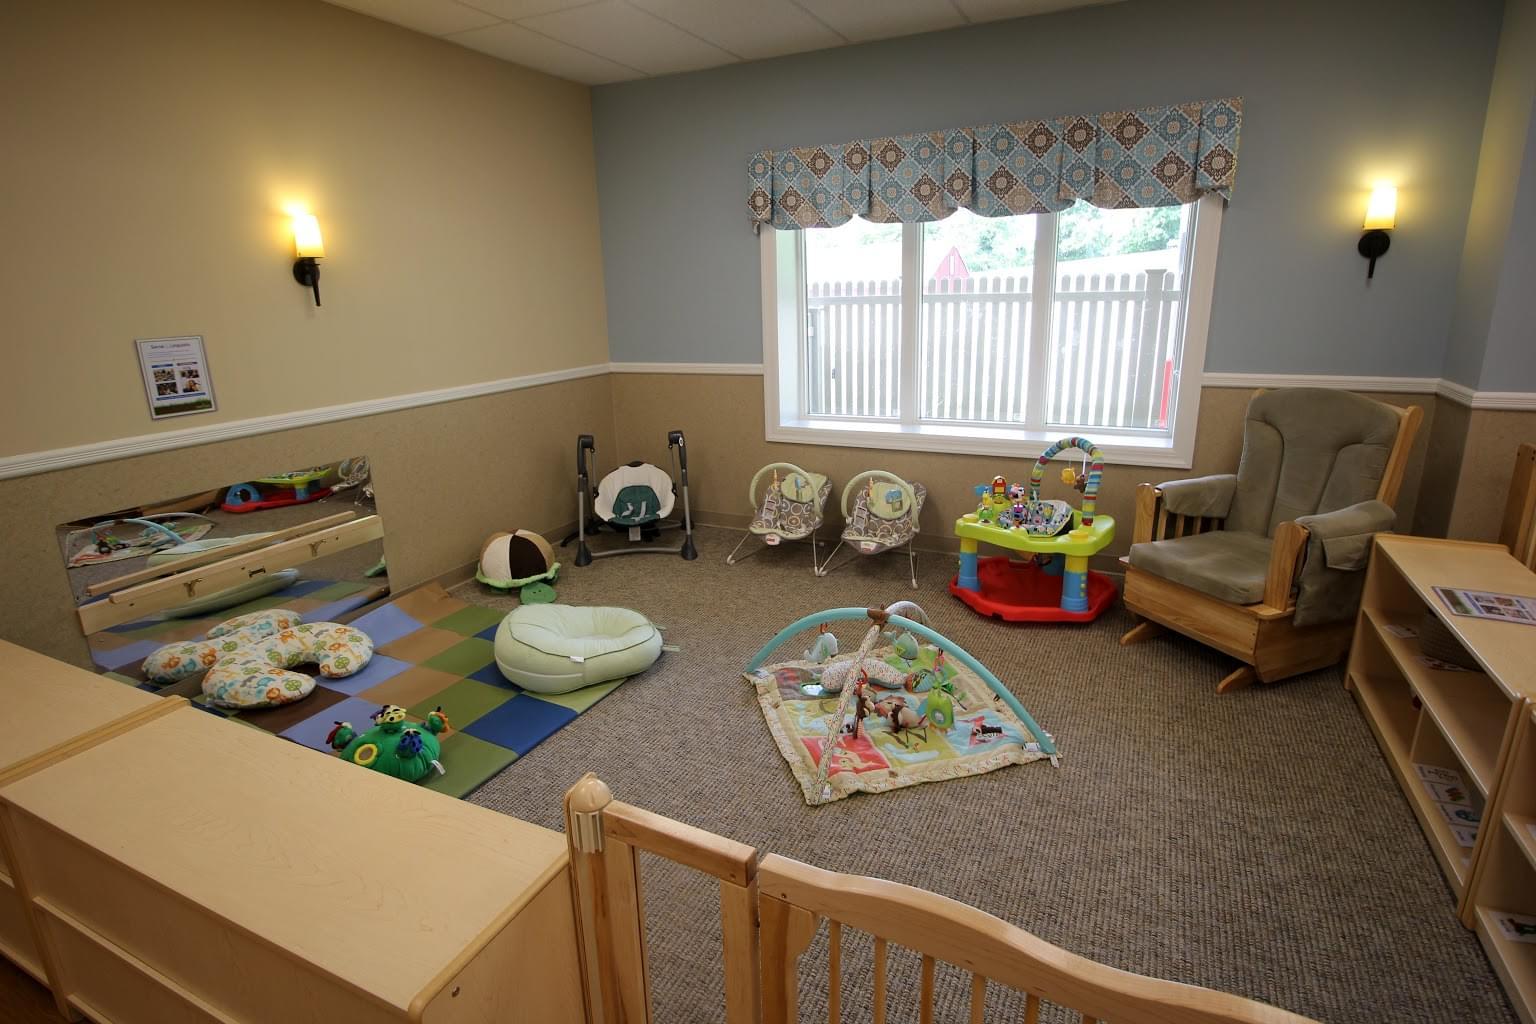 Lightbridge Academy Daycare in Fanwood, NJ infant playpen